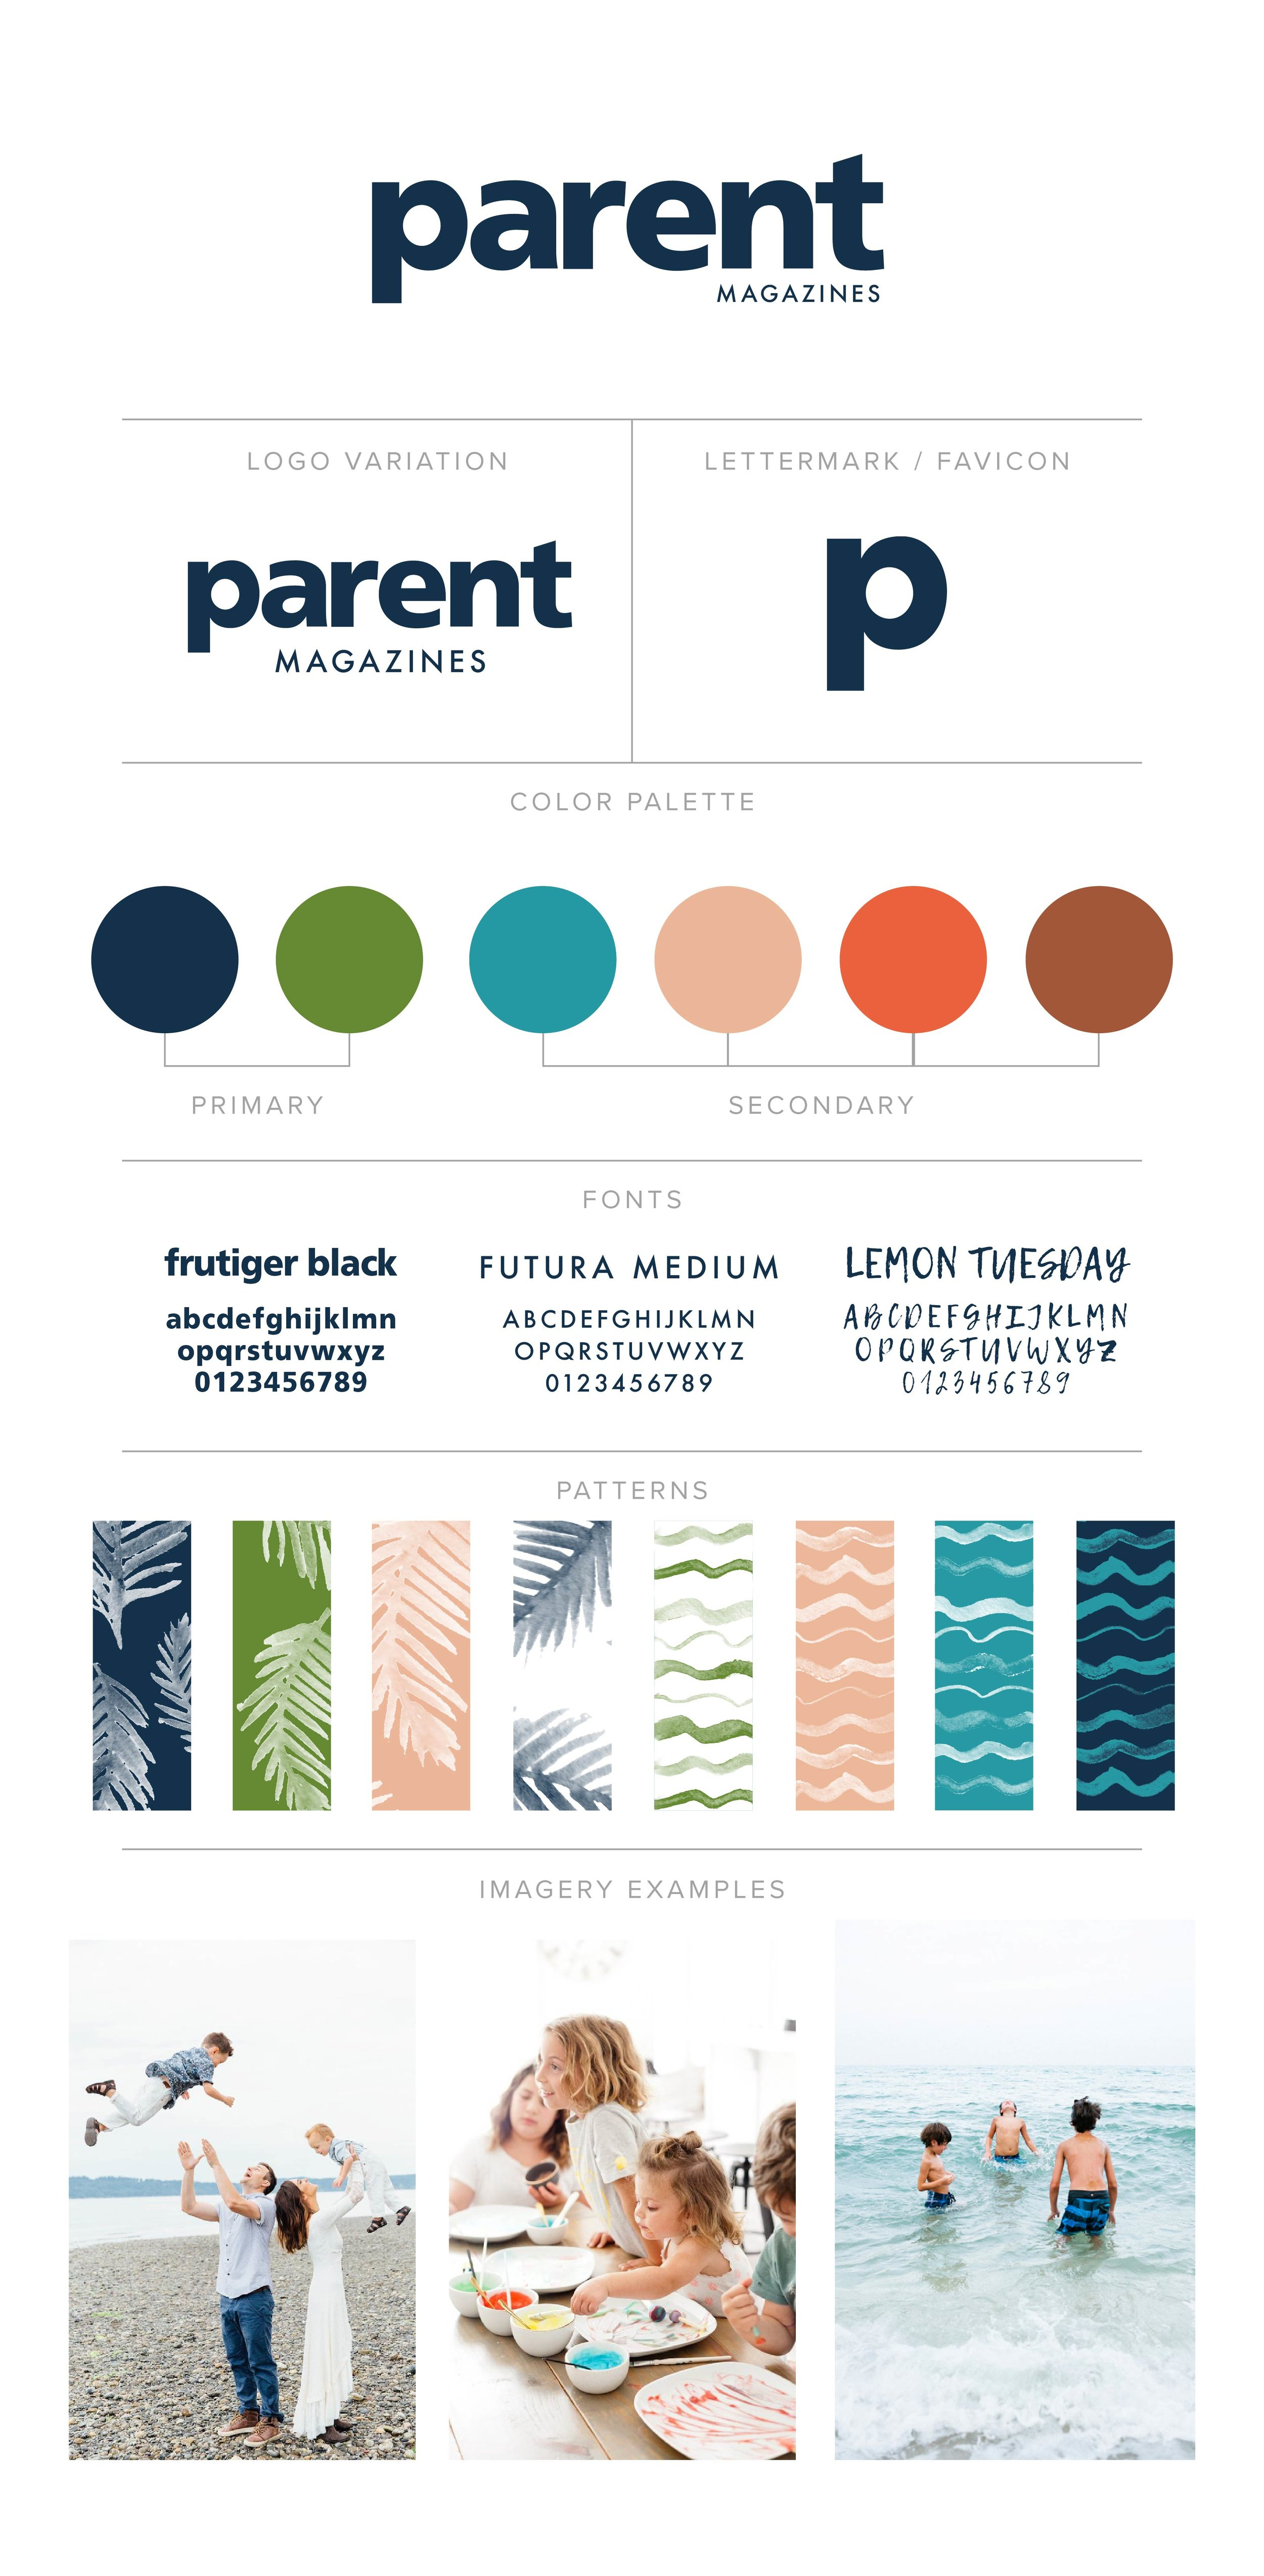 CE Studios: Branding, brand refresh, custom illustrations for parents' magazine